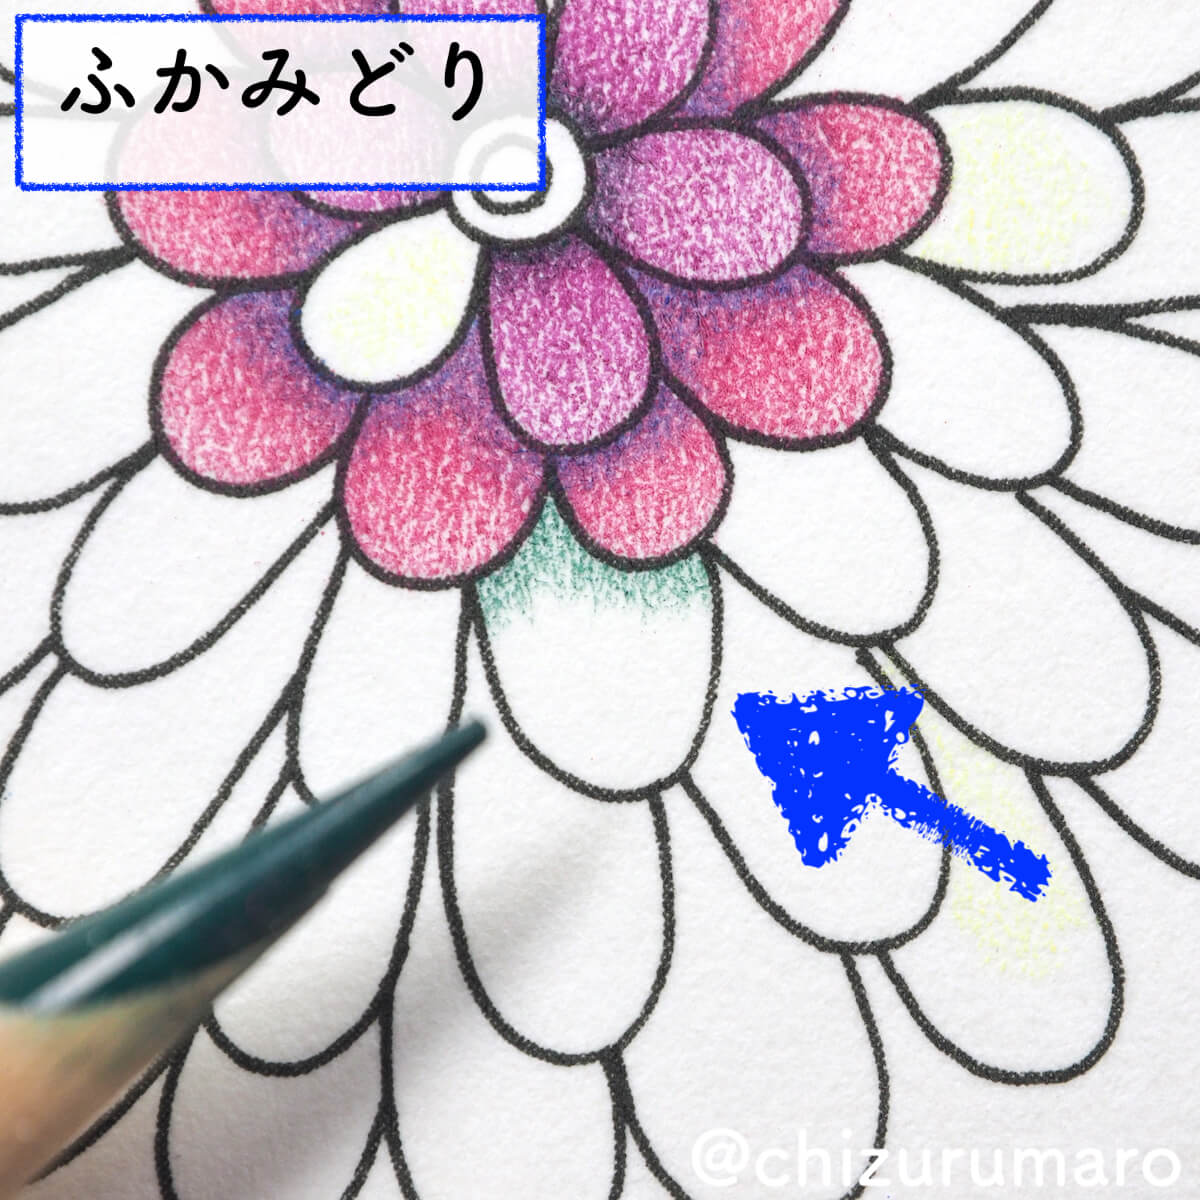 f:id:chizurumaro:20200415163120j:plain